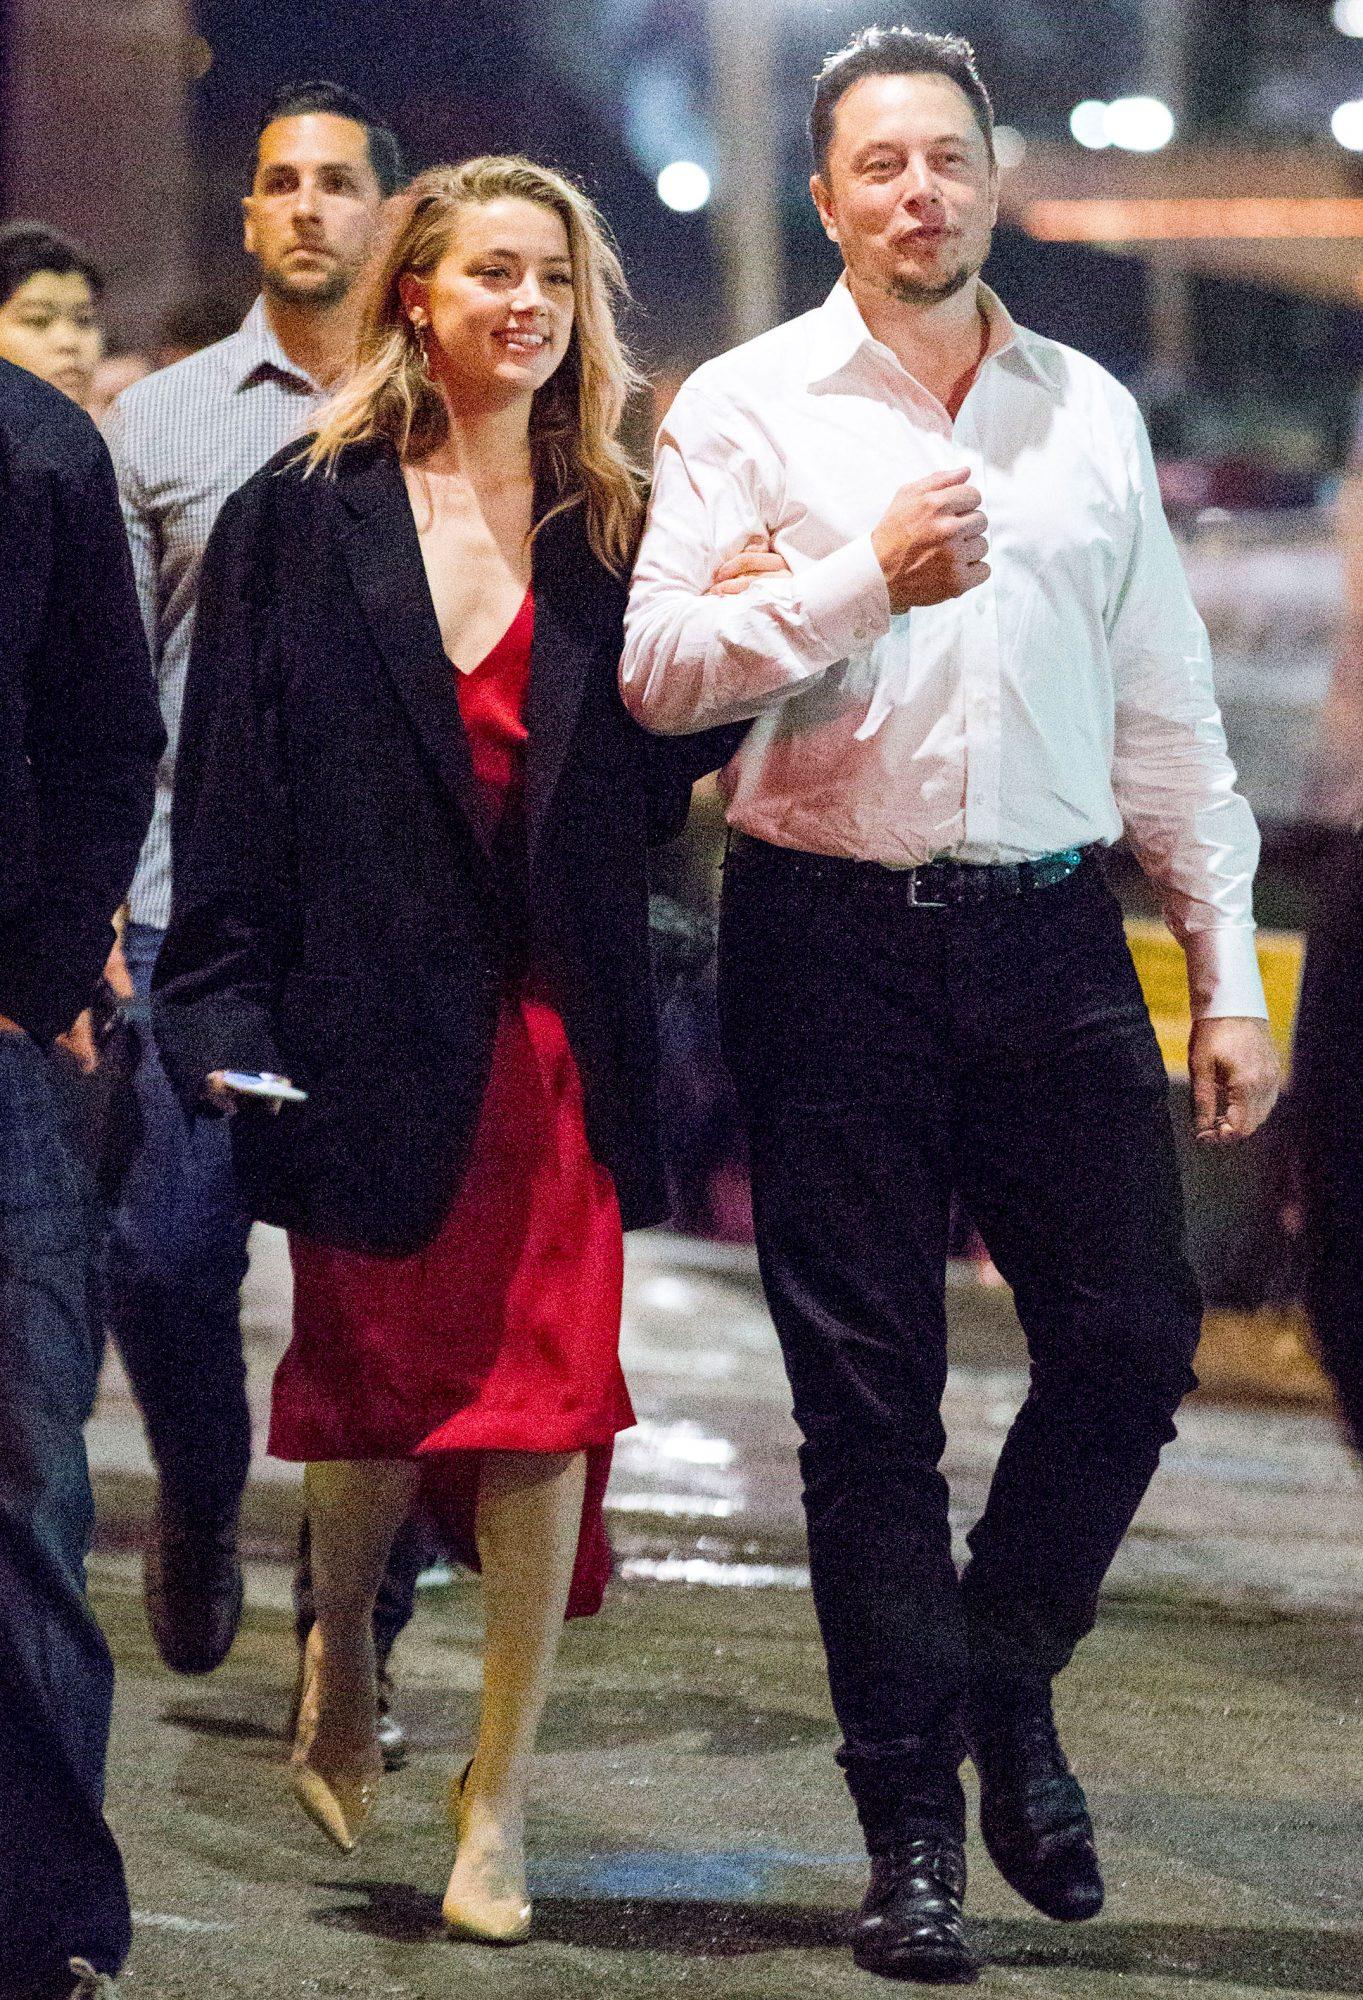 Elon with Ex-Girlfriend Amber Heard